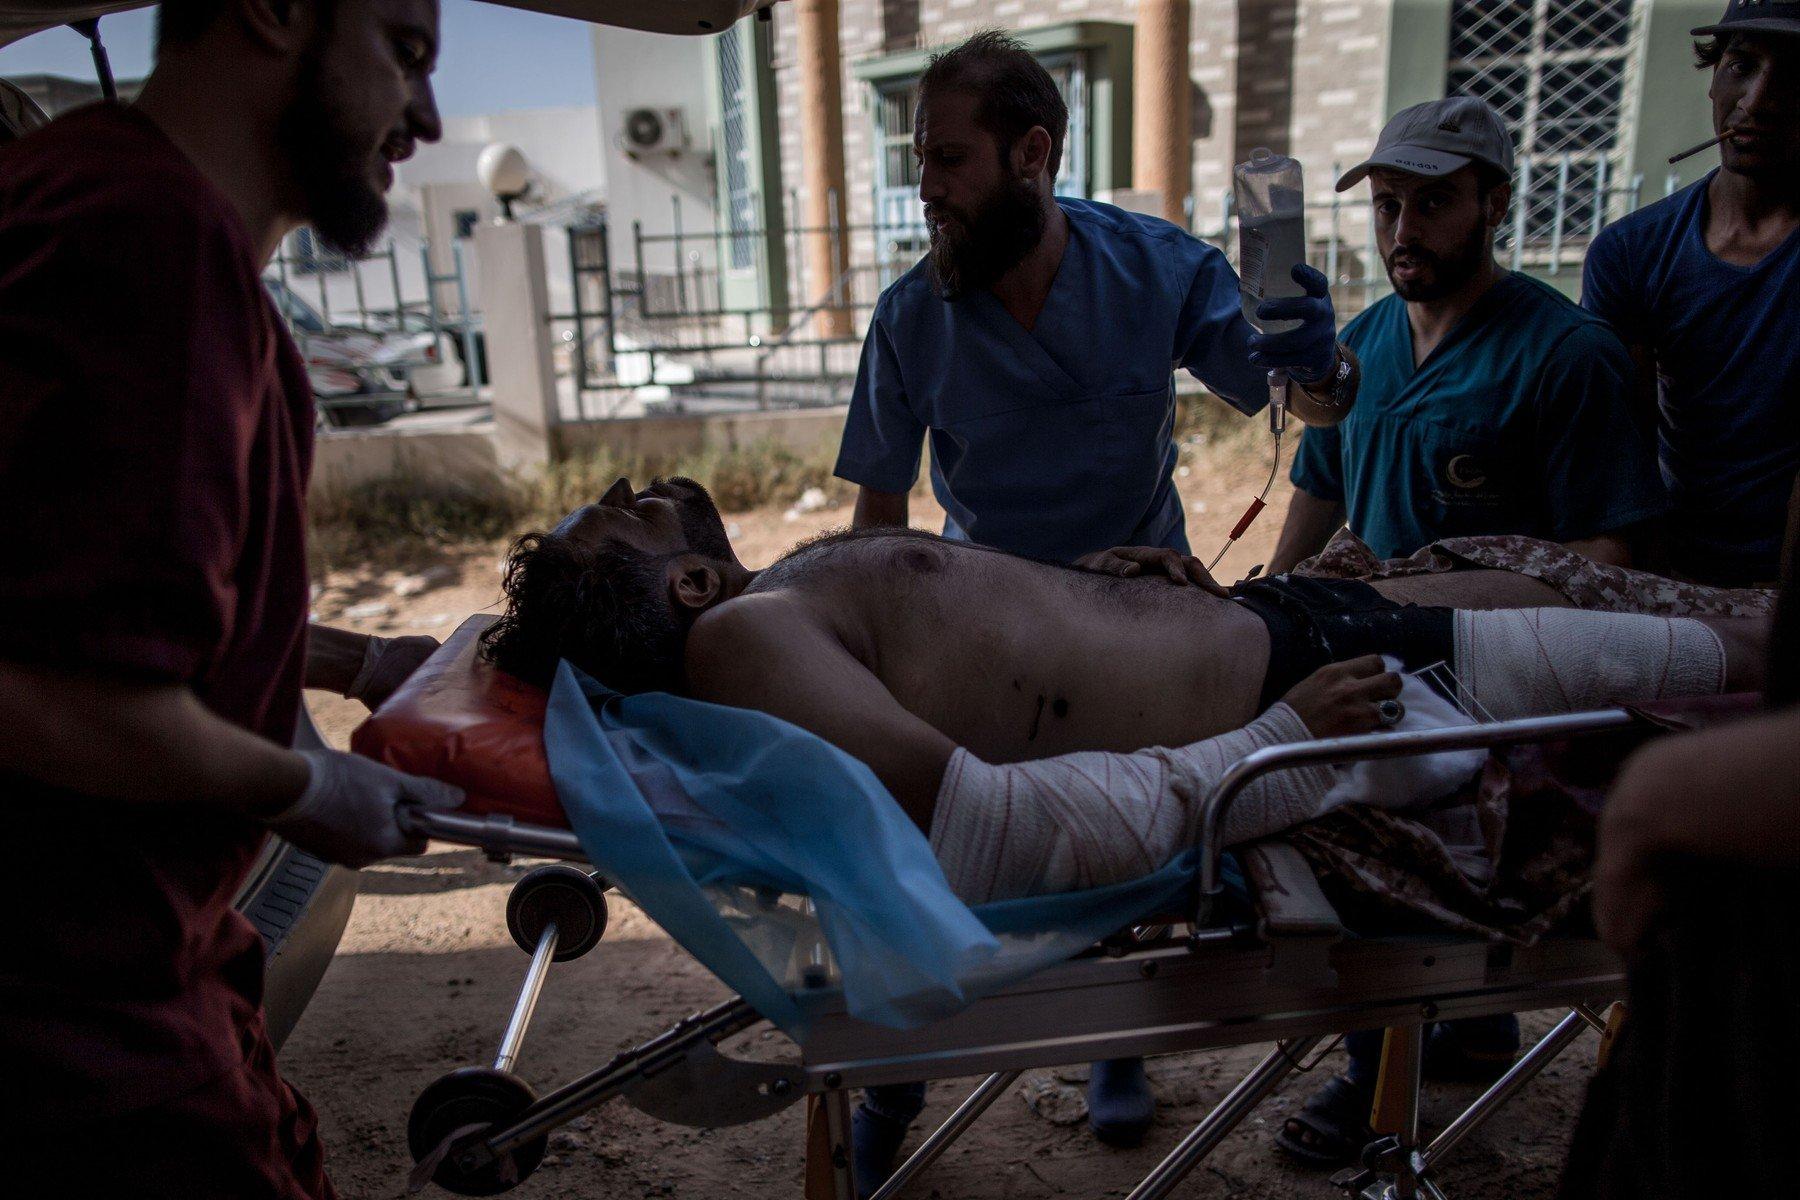 Ilustracija: Napad na Tripoli, Libija